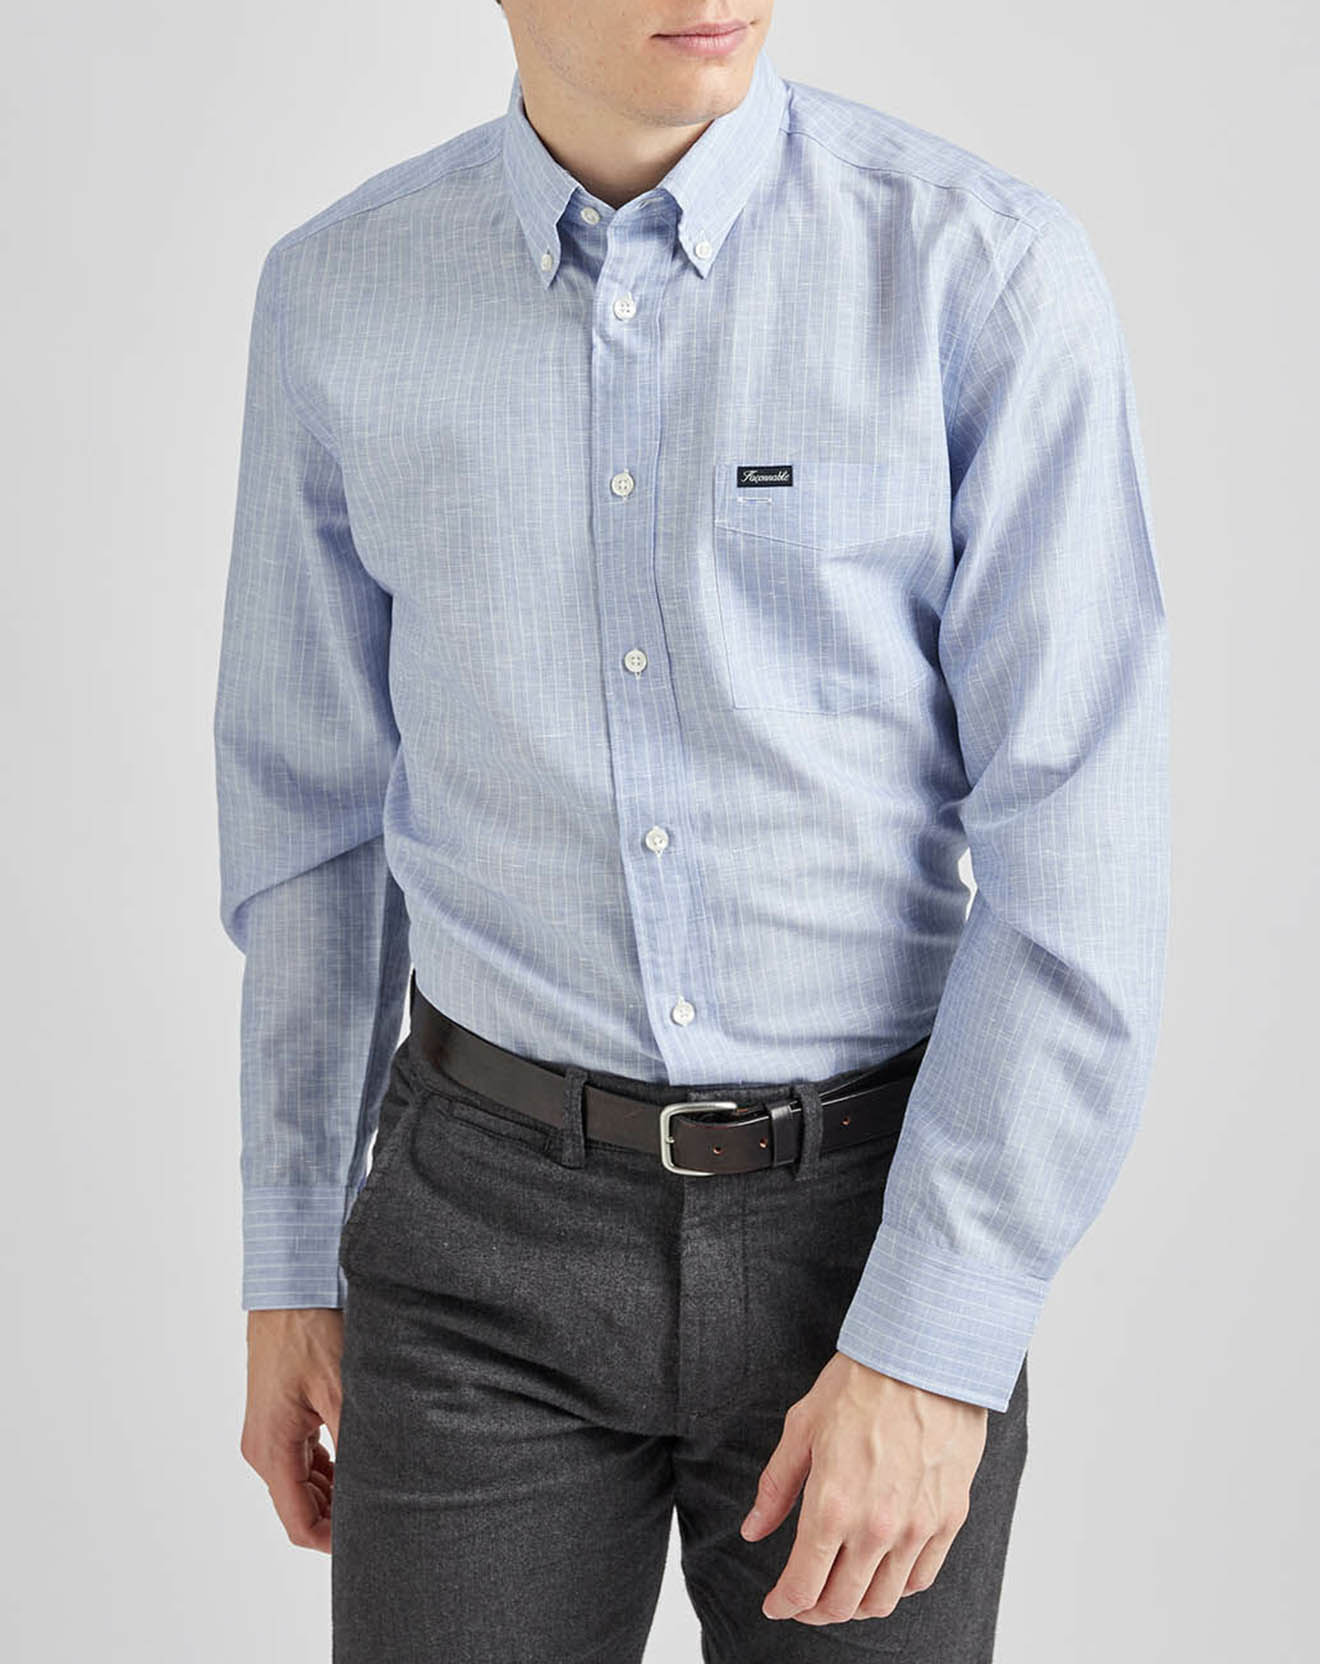 Chemise sportswear bleu jeans - Façonnable - Modalova